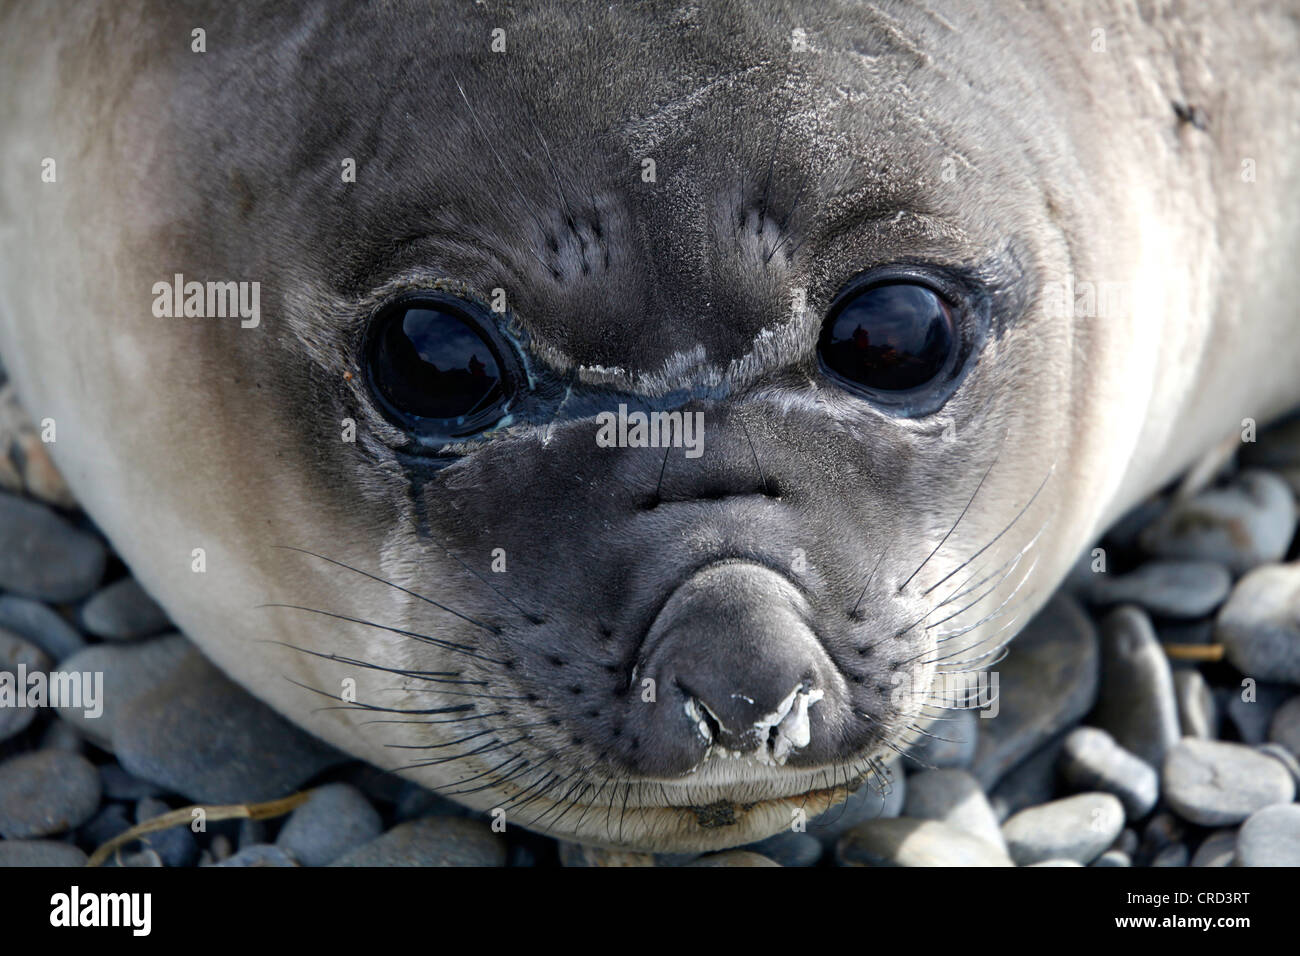 Fur seal, portrait, South Georgia - Stock Image